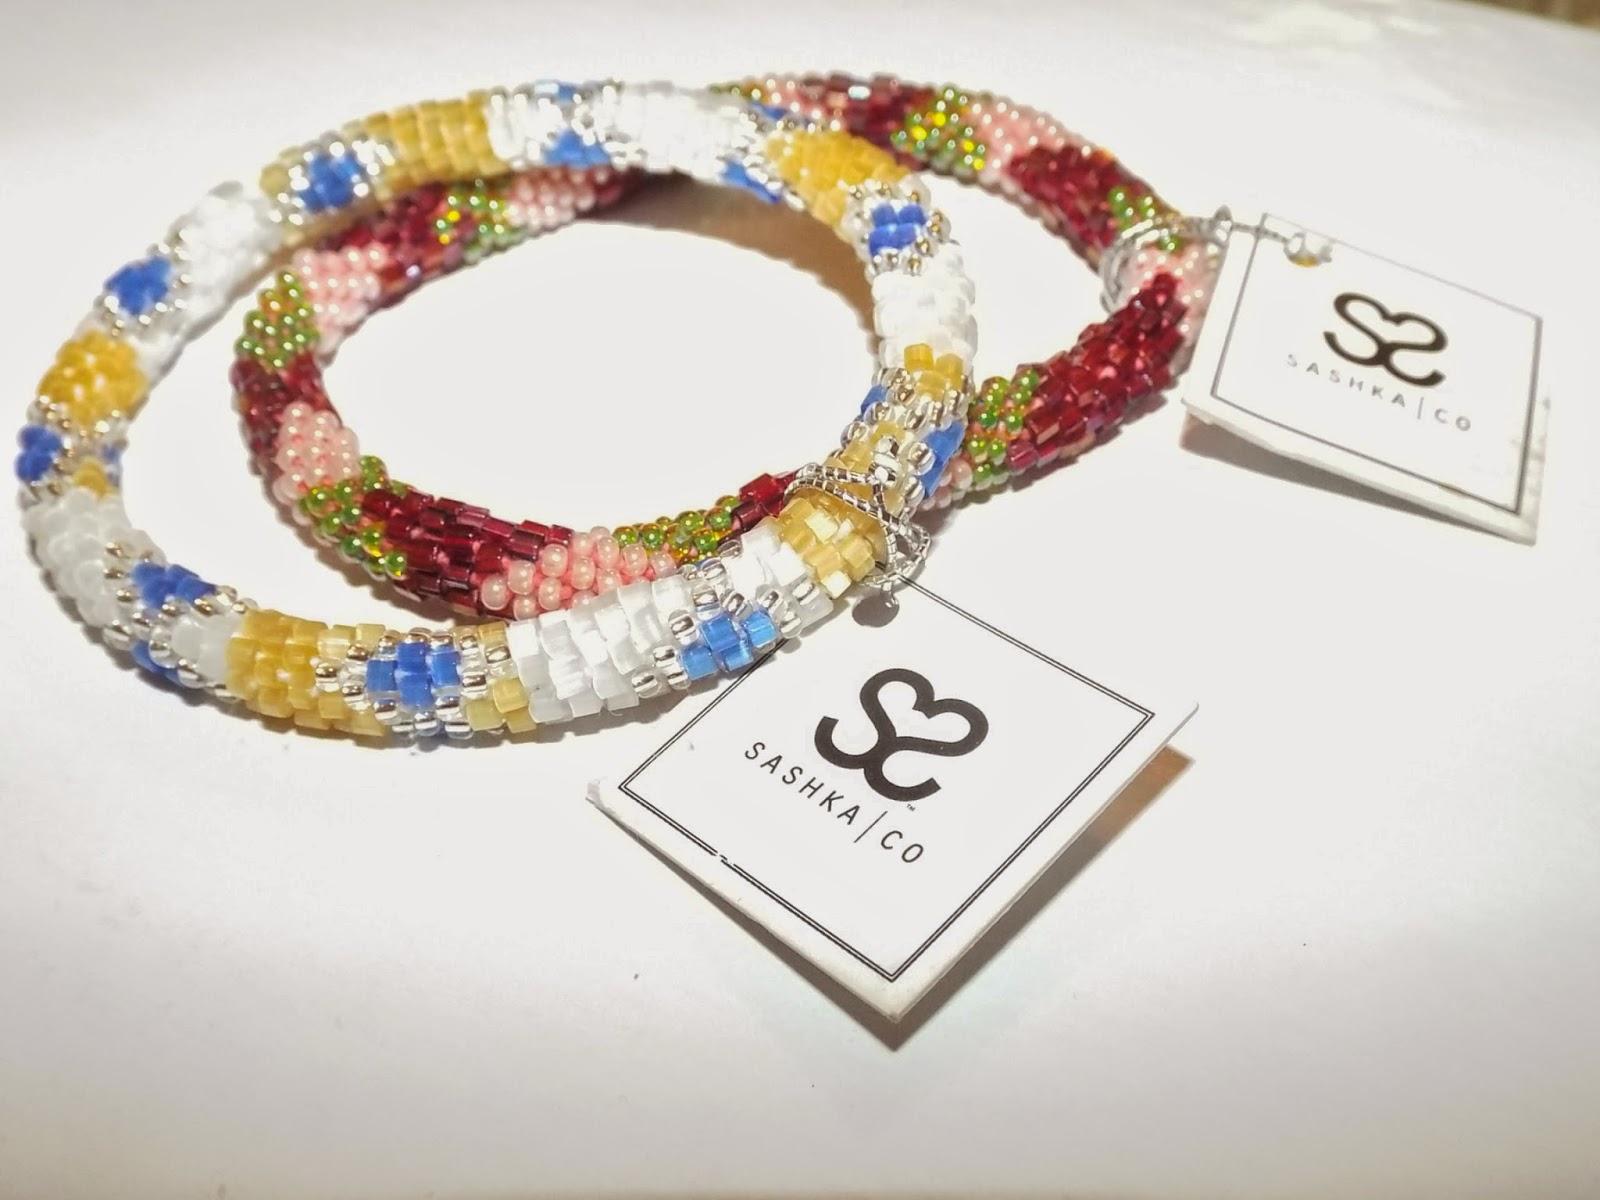 Handbeaded bracelets